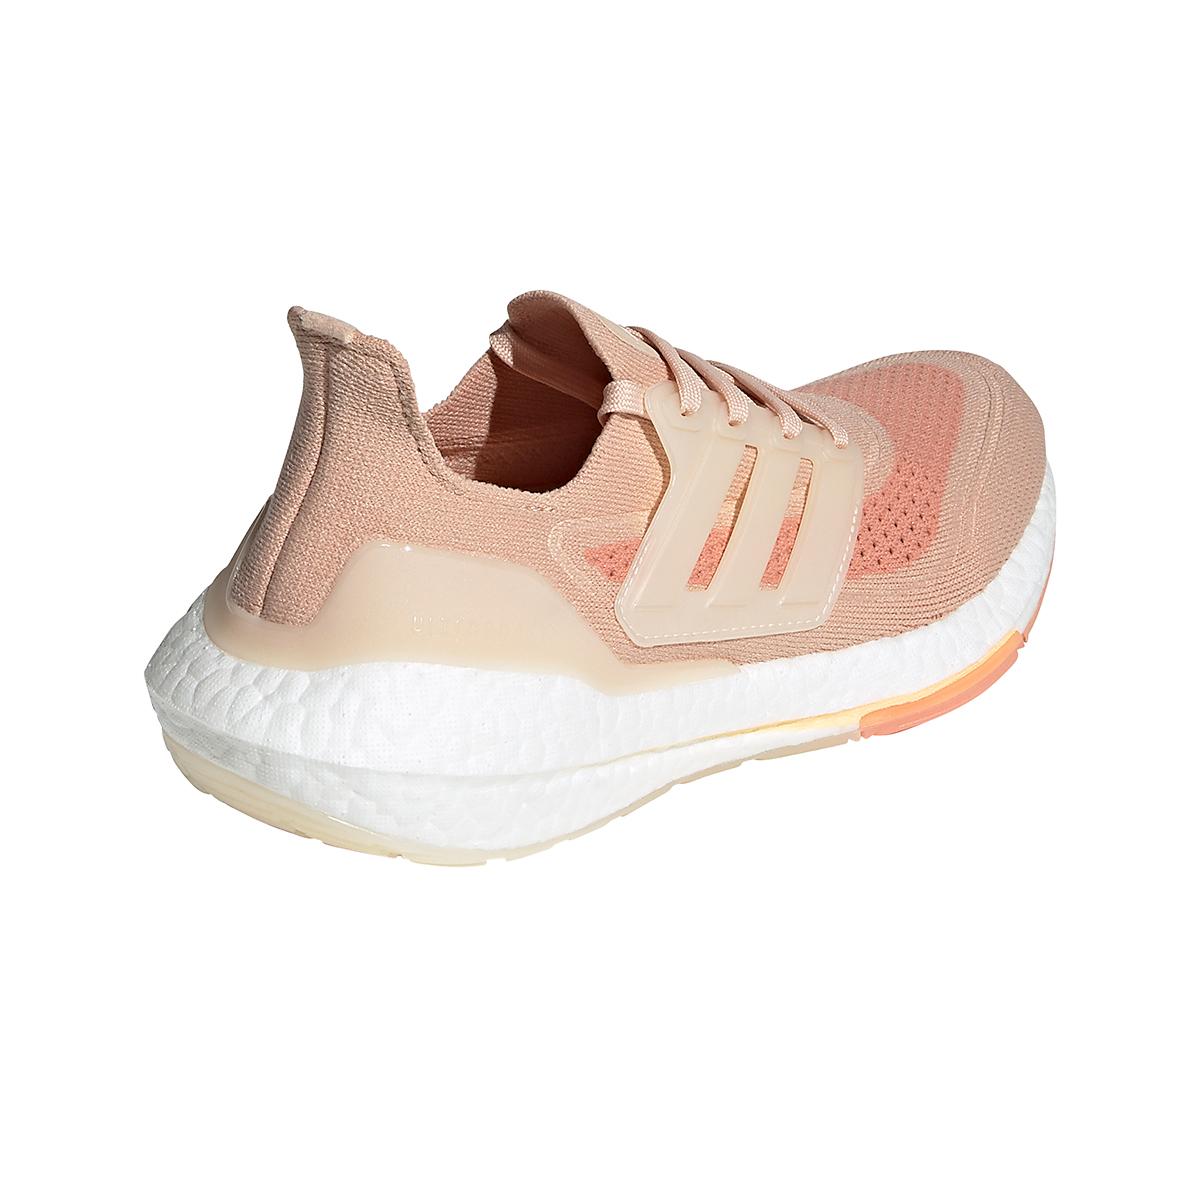 Women's Adidas Ultraboost 21 Running Shoe - Color: Halo Blush/Wonder White/Ambient Blush - Size: 5 - Width: Regular, Halo Blush/Wonder White/Ambient Blush, large, image 4